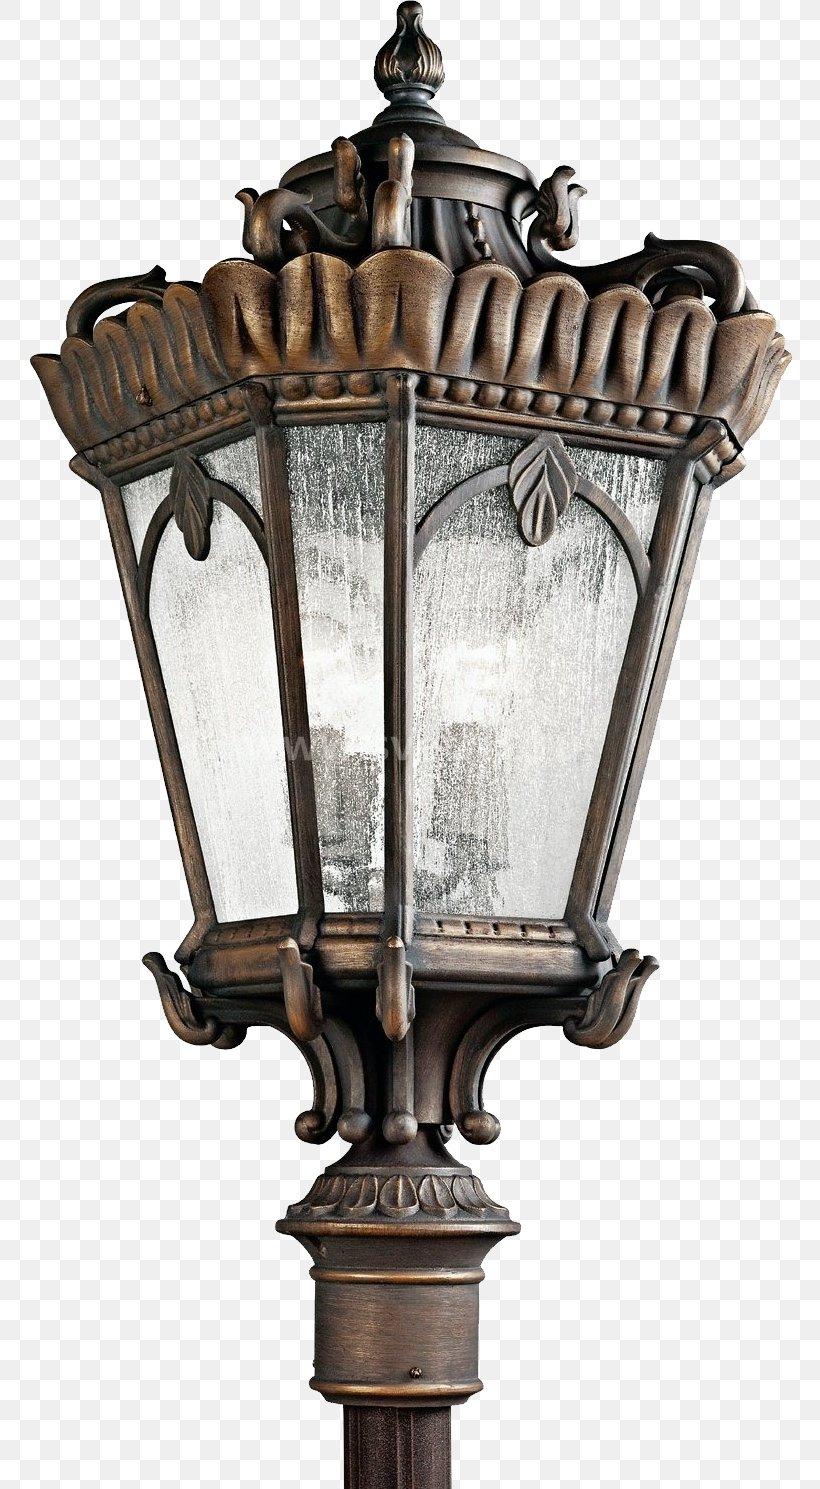 Lighting Street Light Incandescent Light Bulb Lantern, PNG, 766x1489px, Light, Electric Light, Gas Lighting, Incandescent Light Bulb, Kichler Lighting Download Free